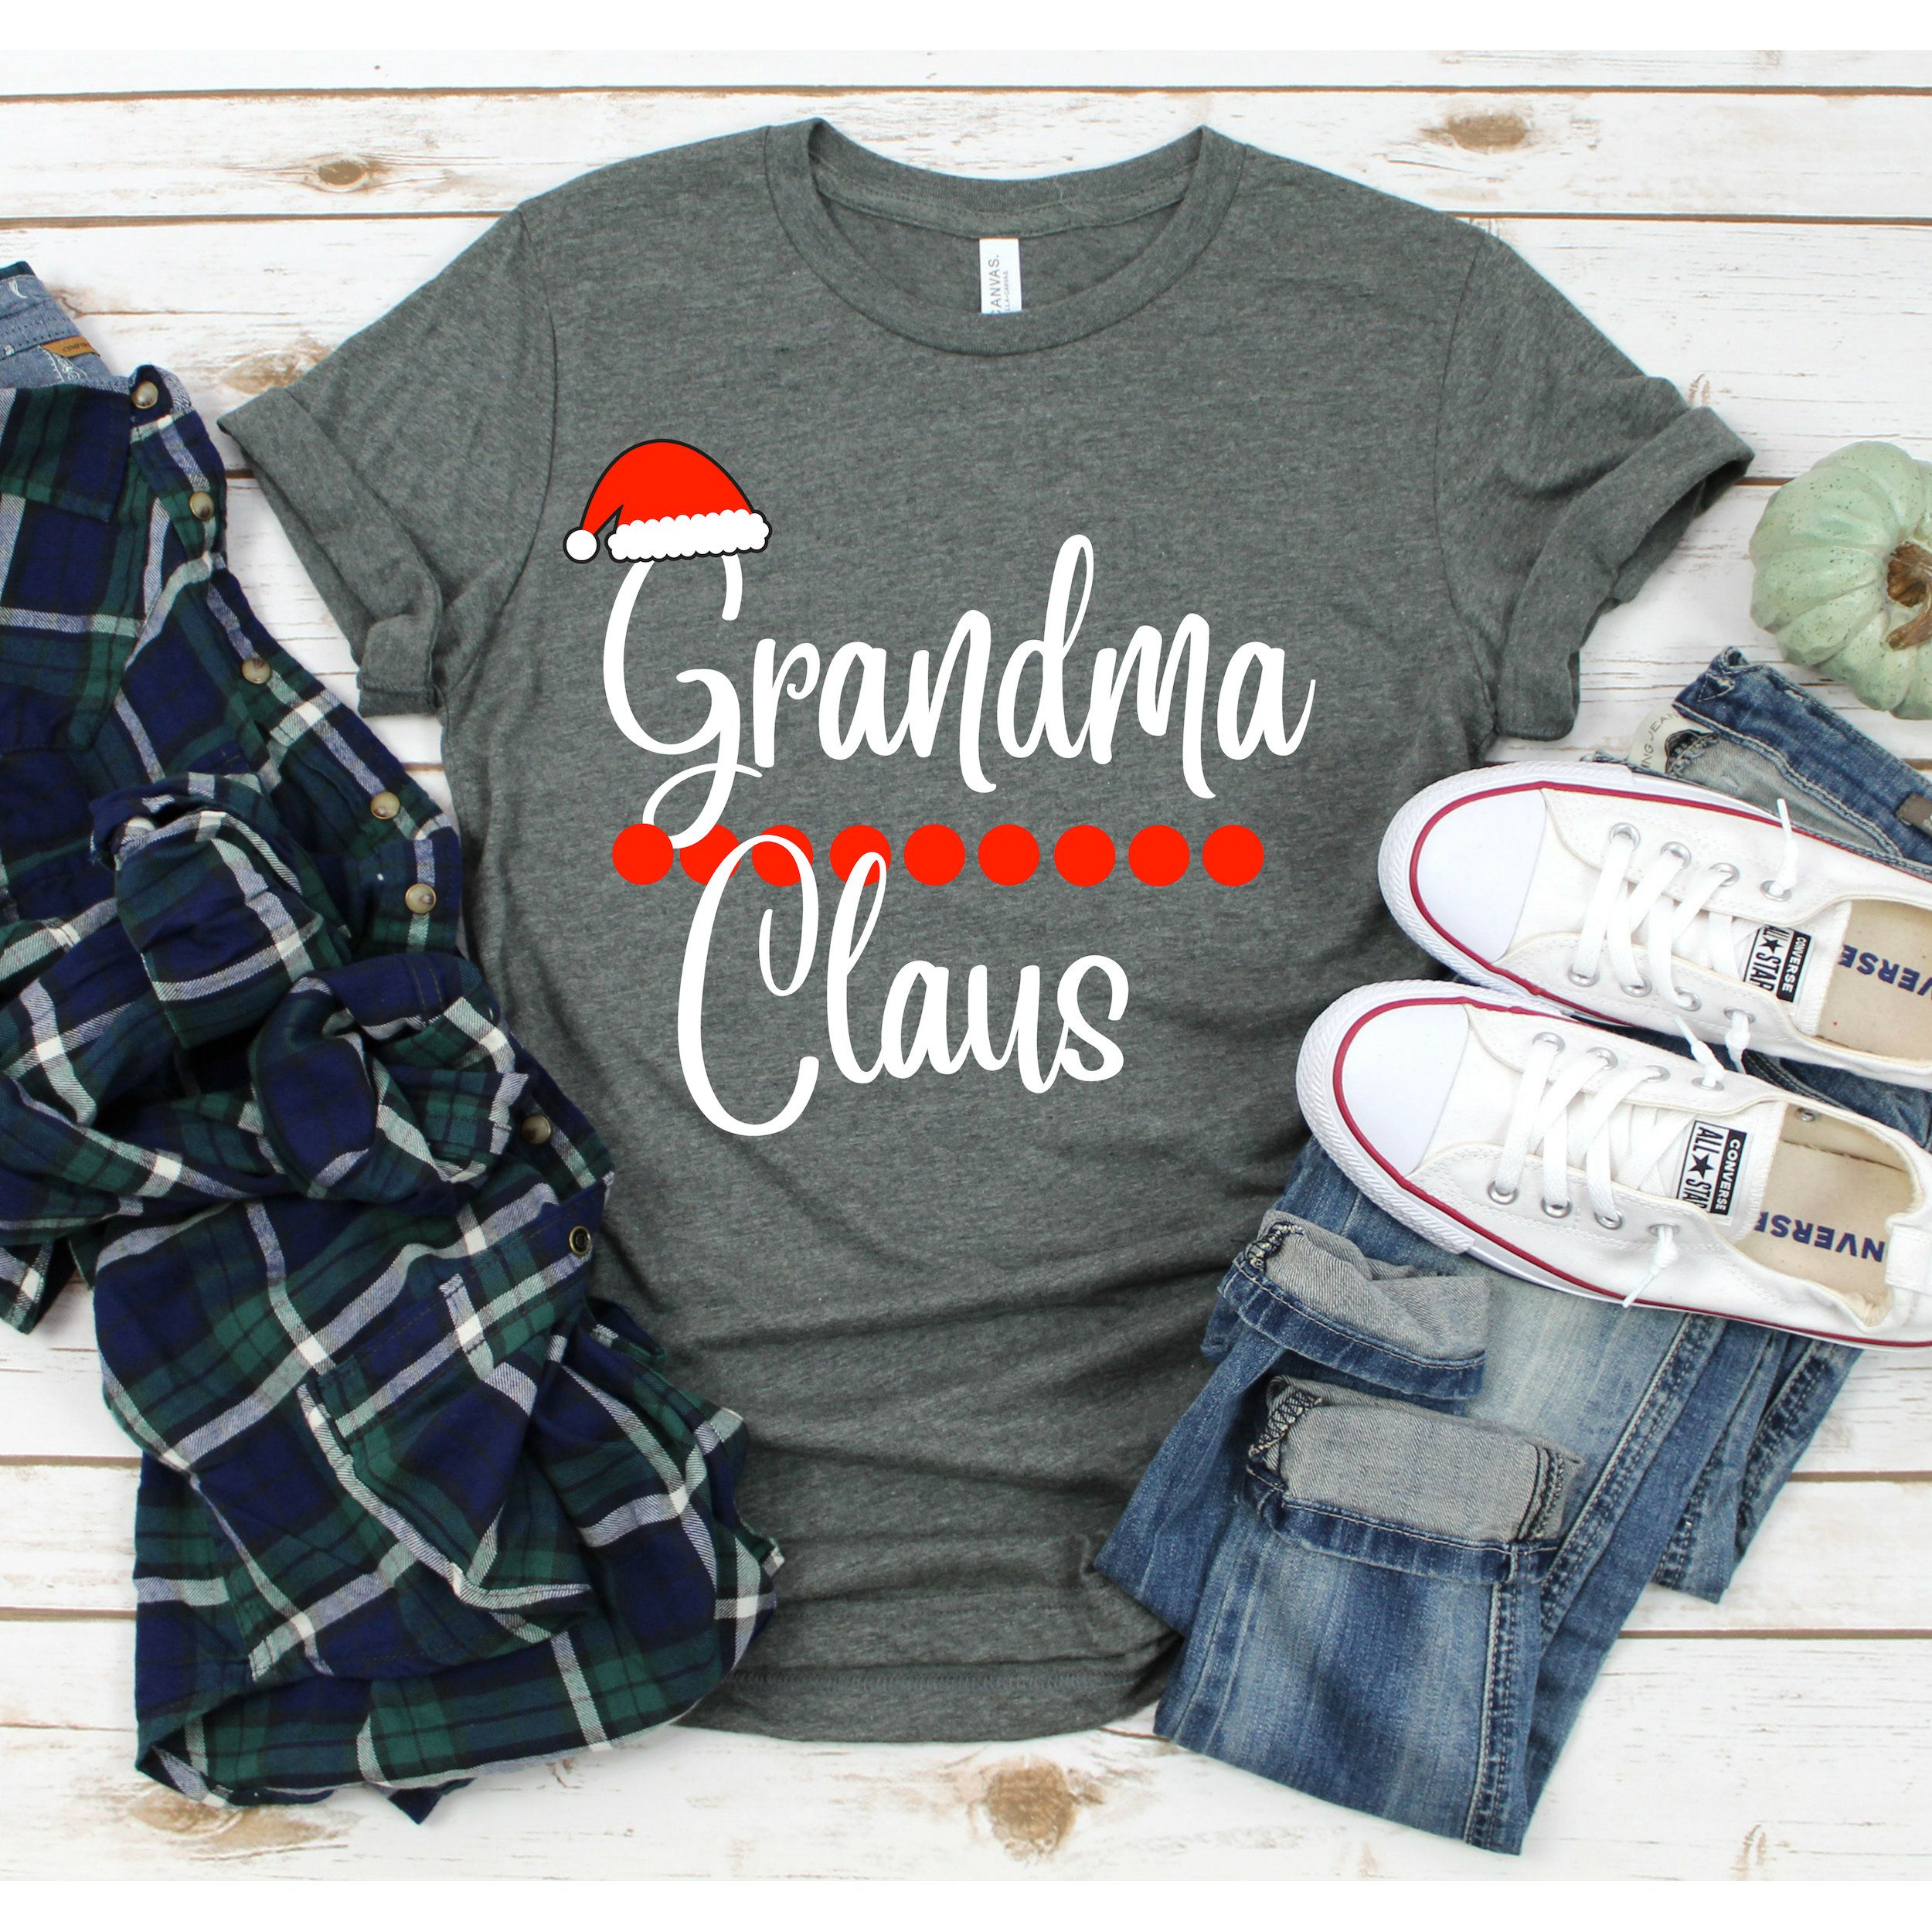 Grandma Claus T Shirt Santa Claus Tee Christmas Gift